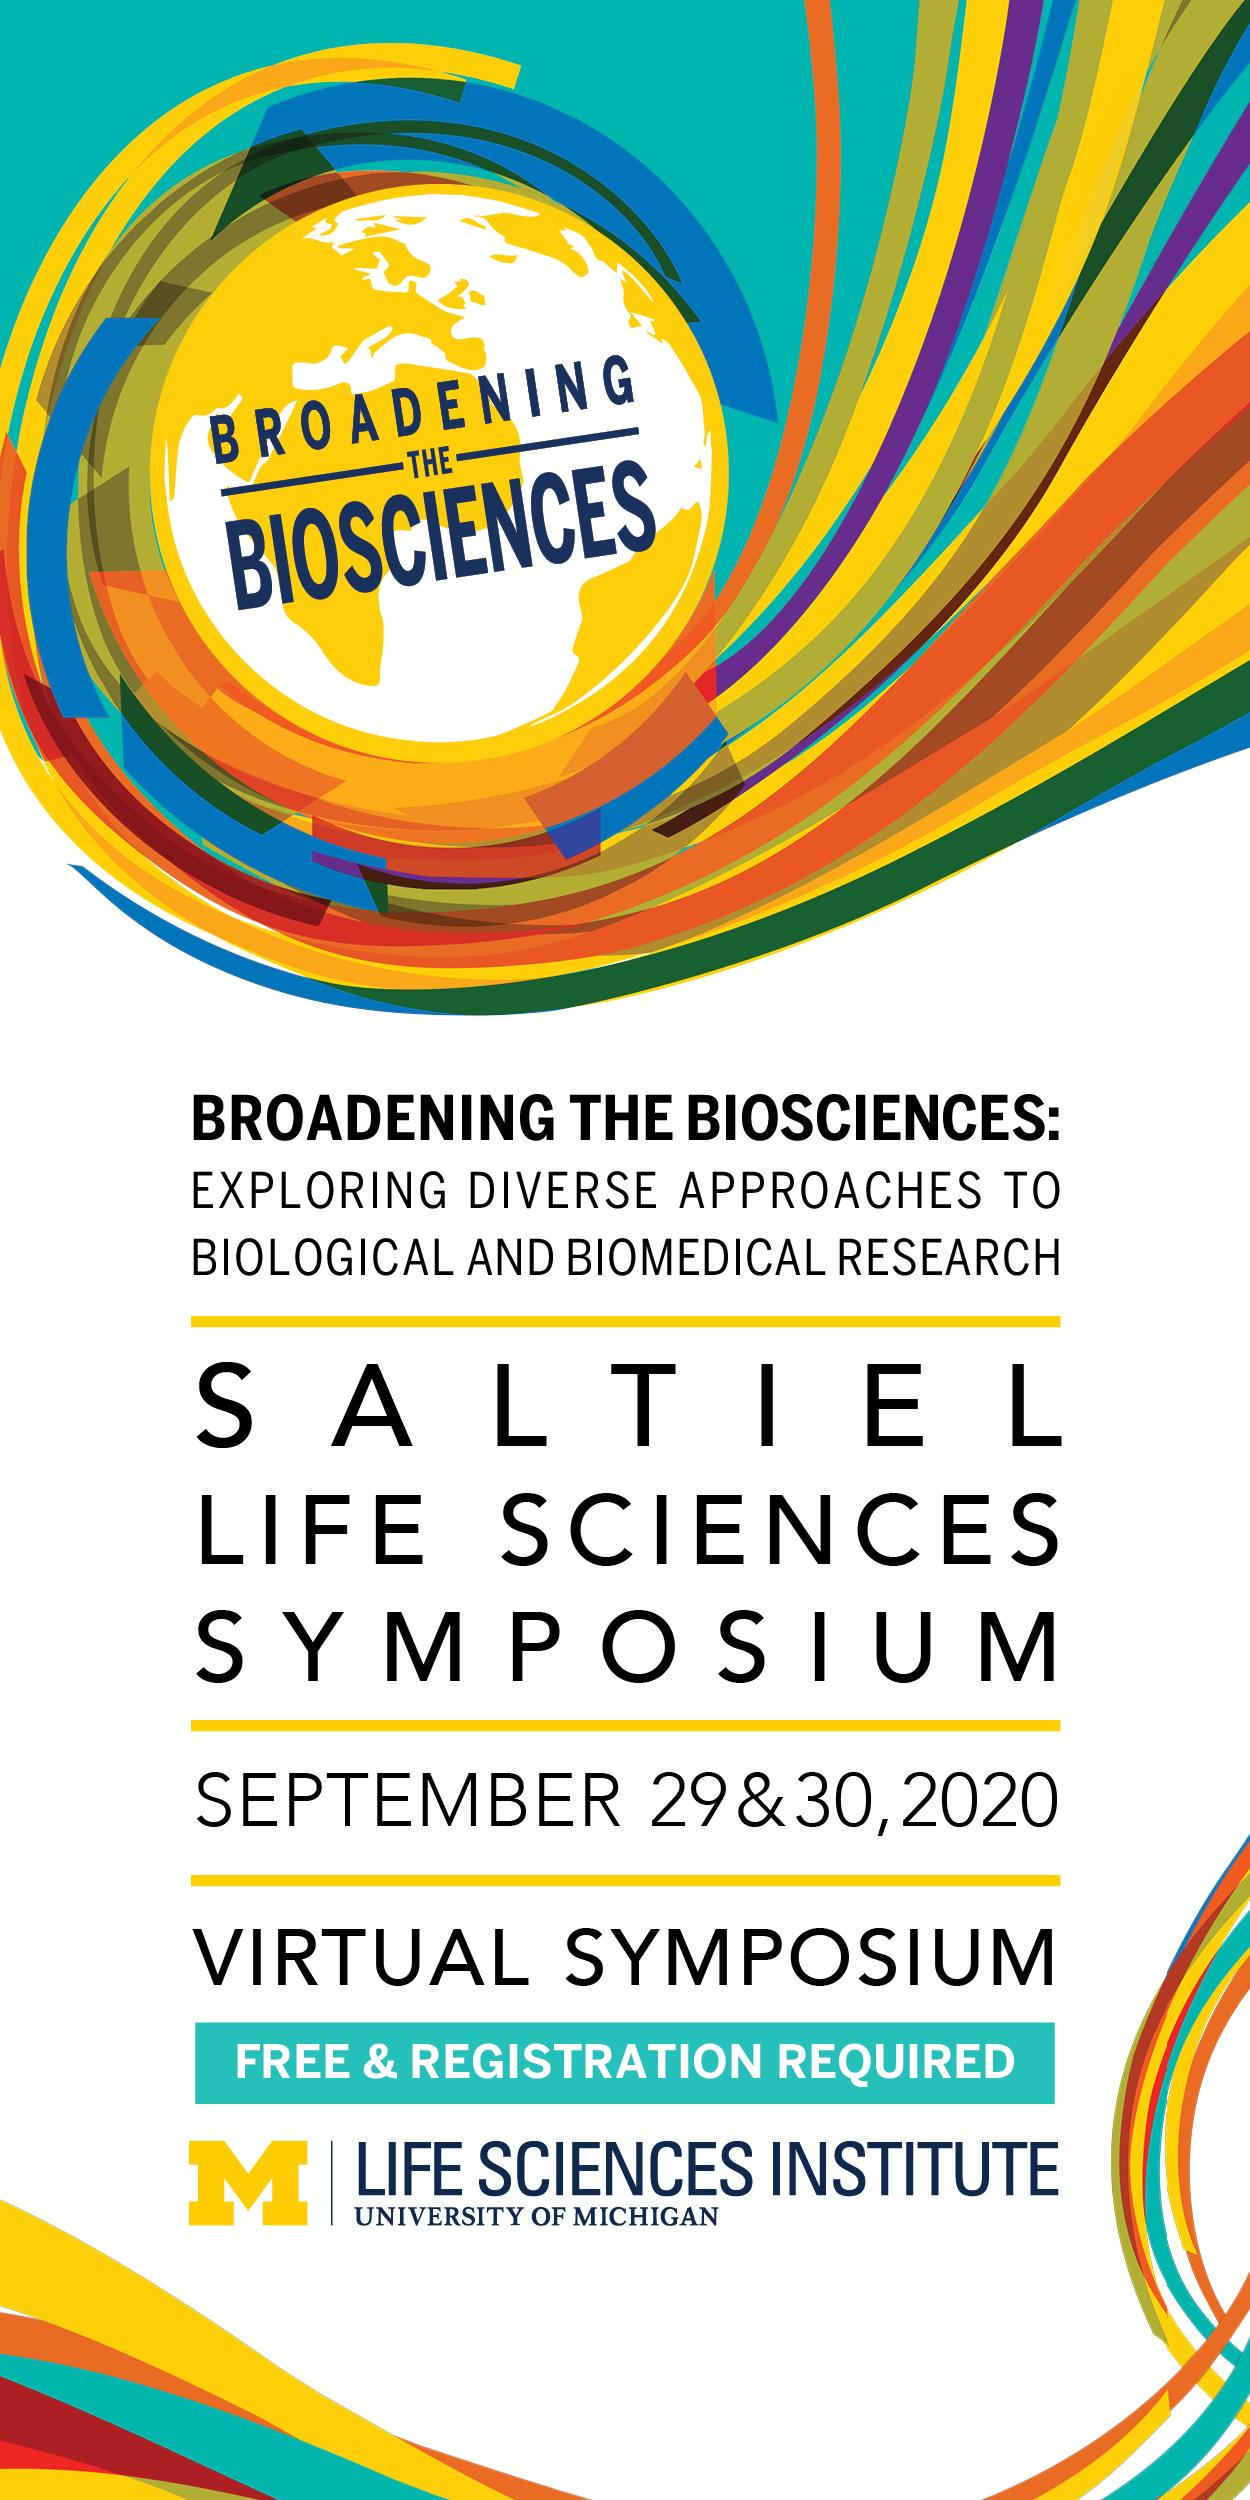 2020 Saltiel Life Sciences Symposium, September 29-30